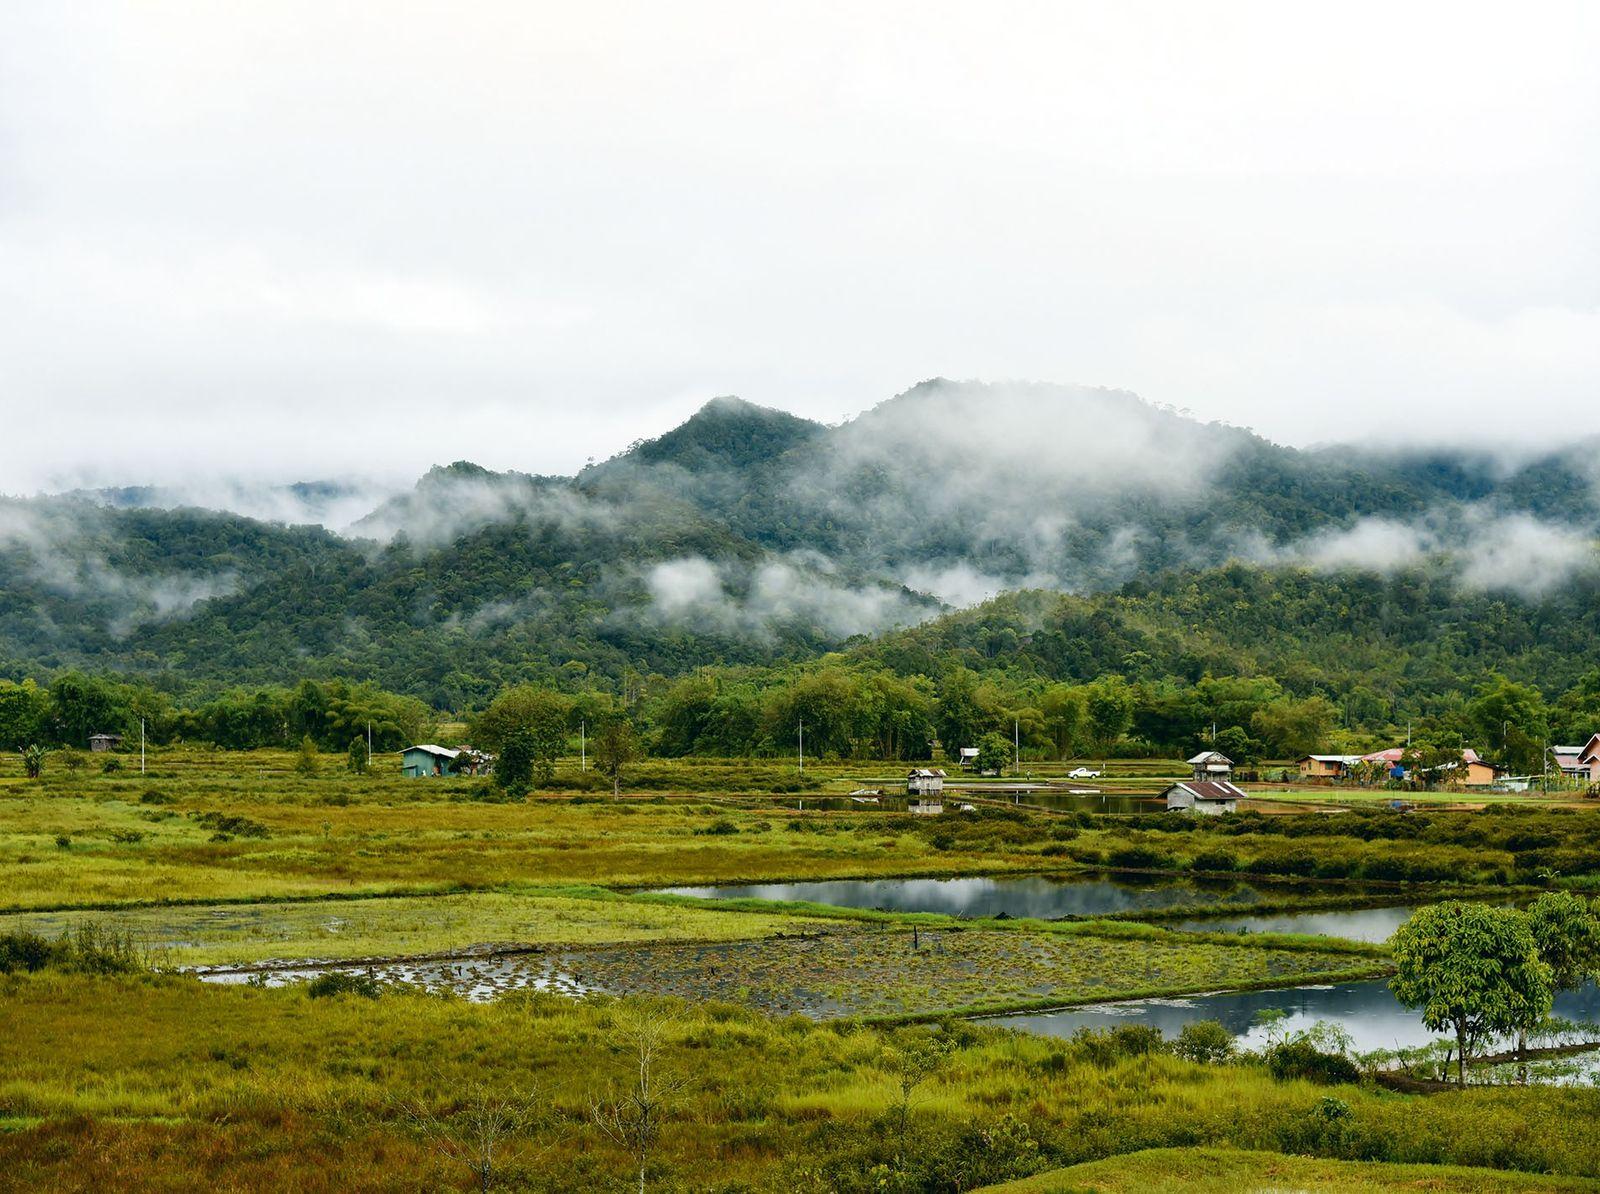 A hidden world deep within the Bornean jungle